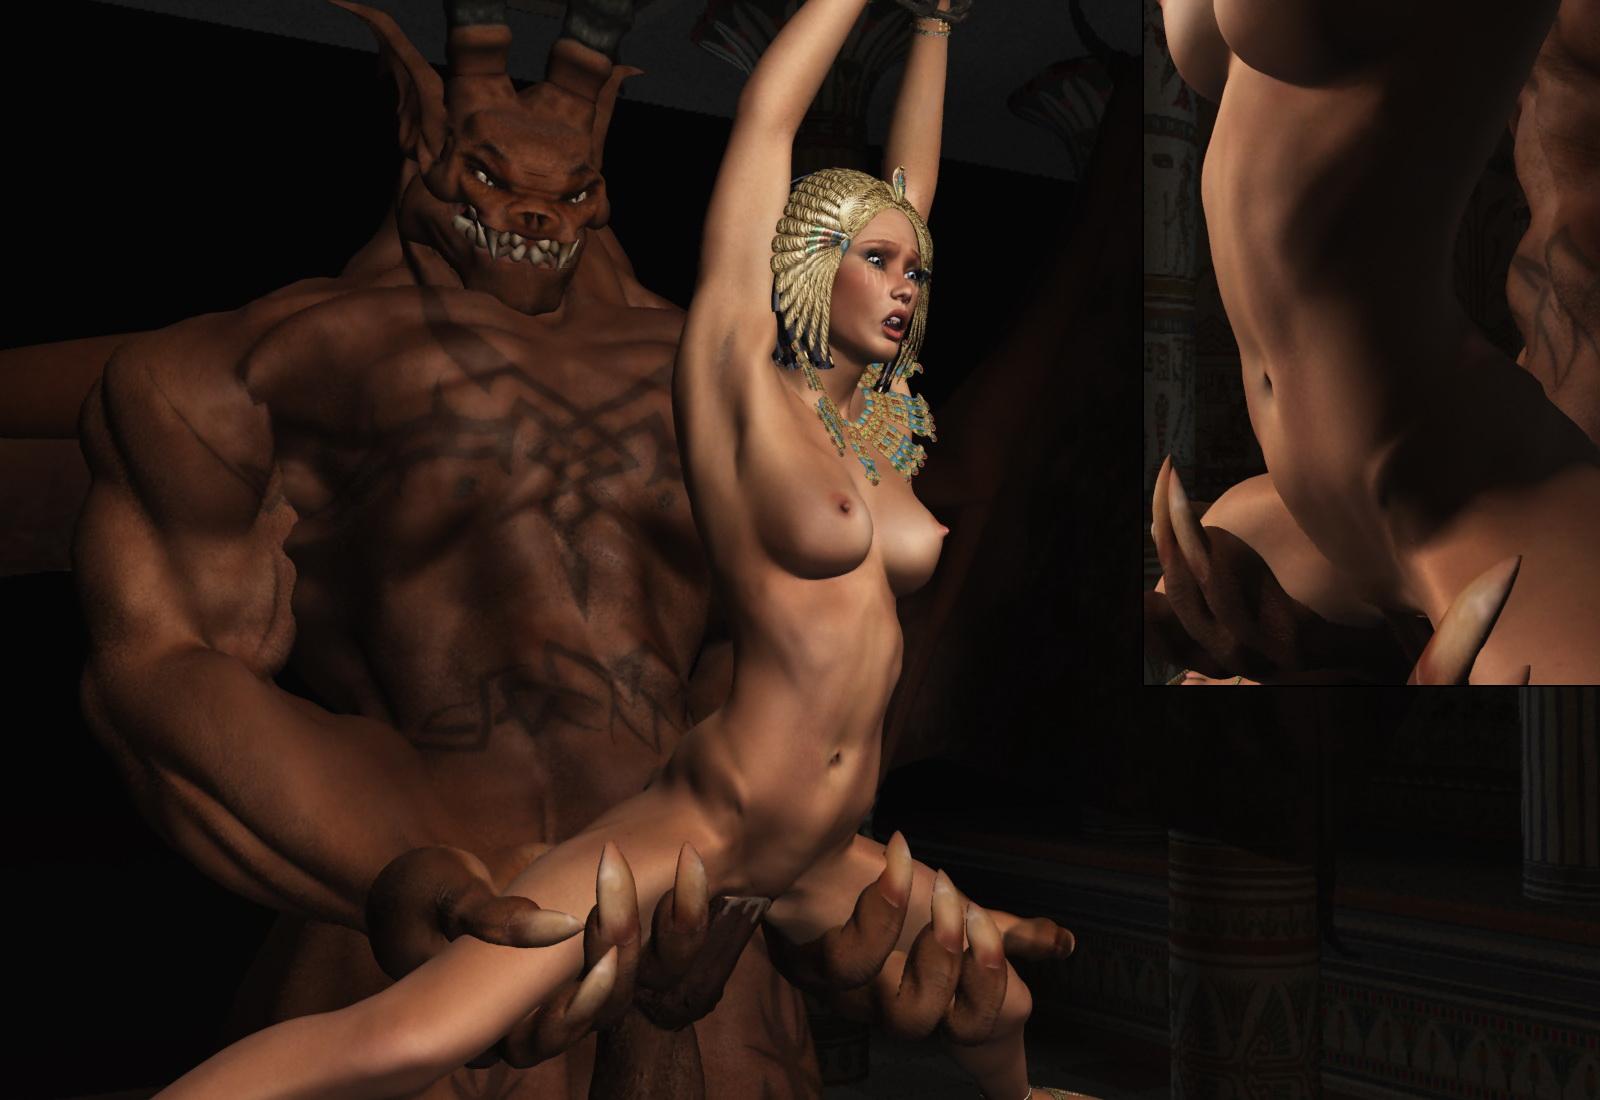 Anime Free Monster Porn monster porn galleries sexy sluts monster anime sex - megapornx